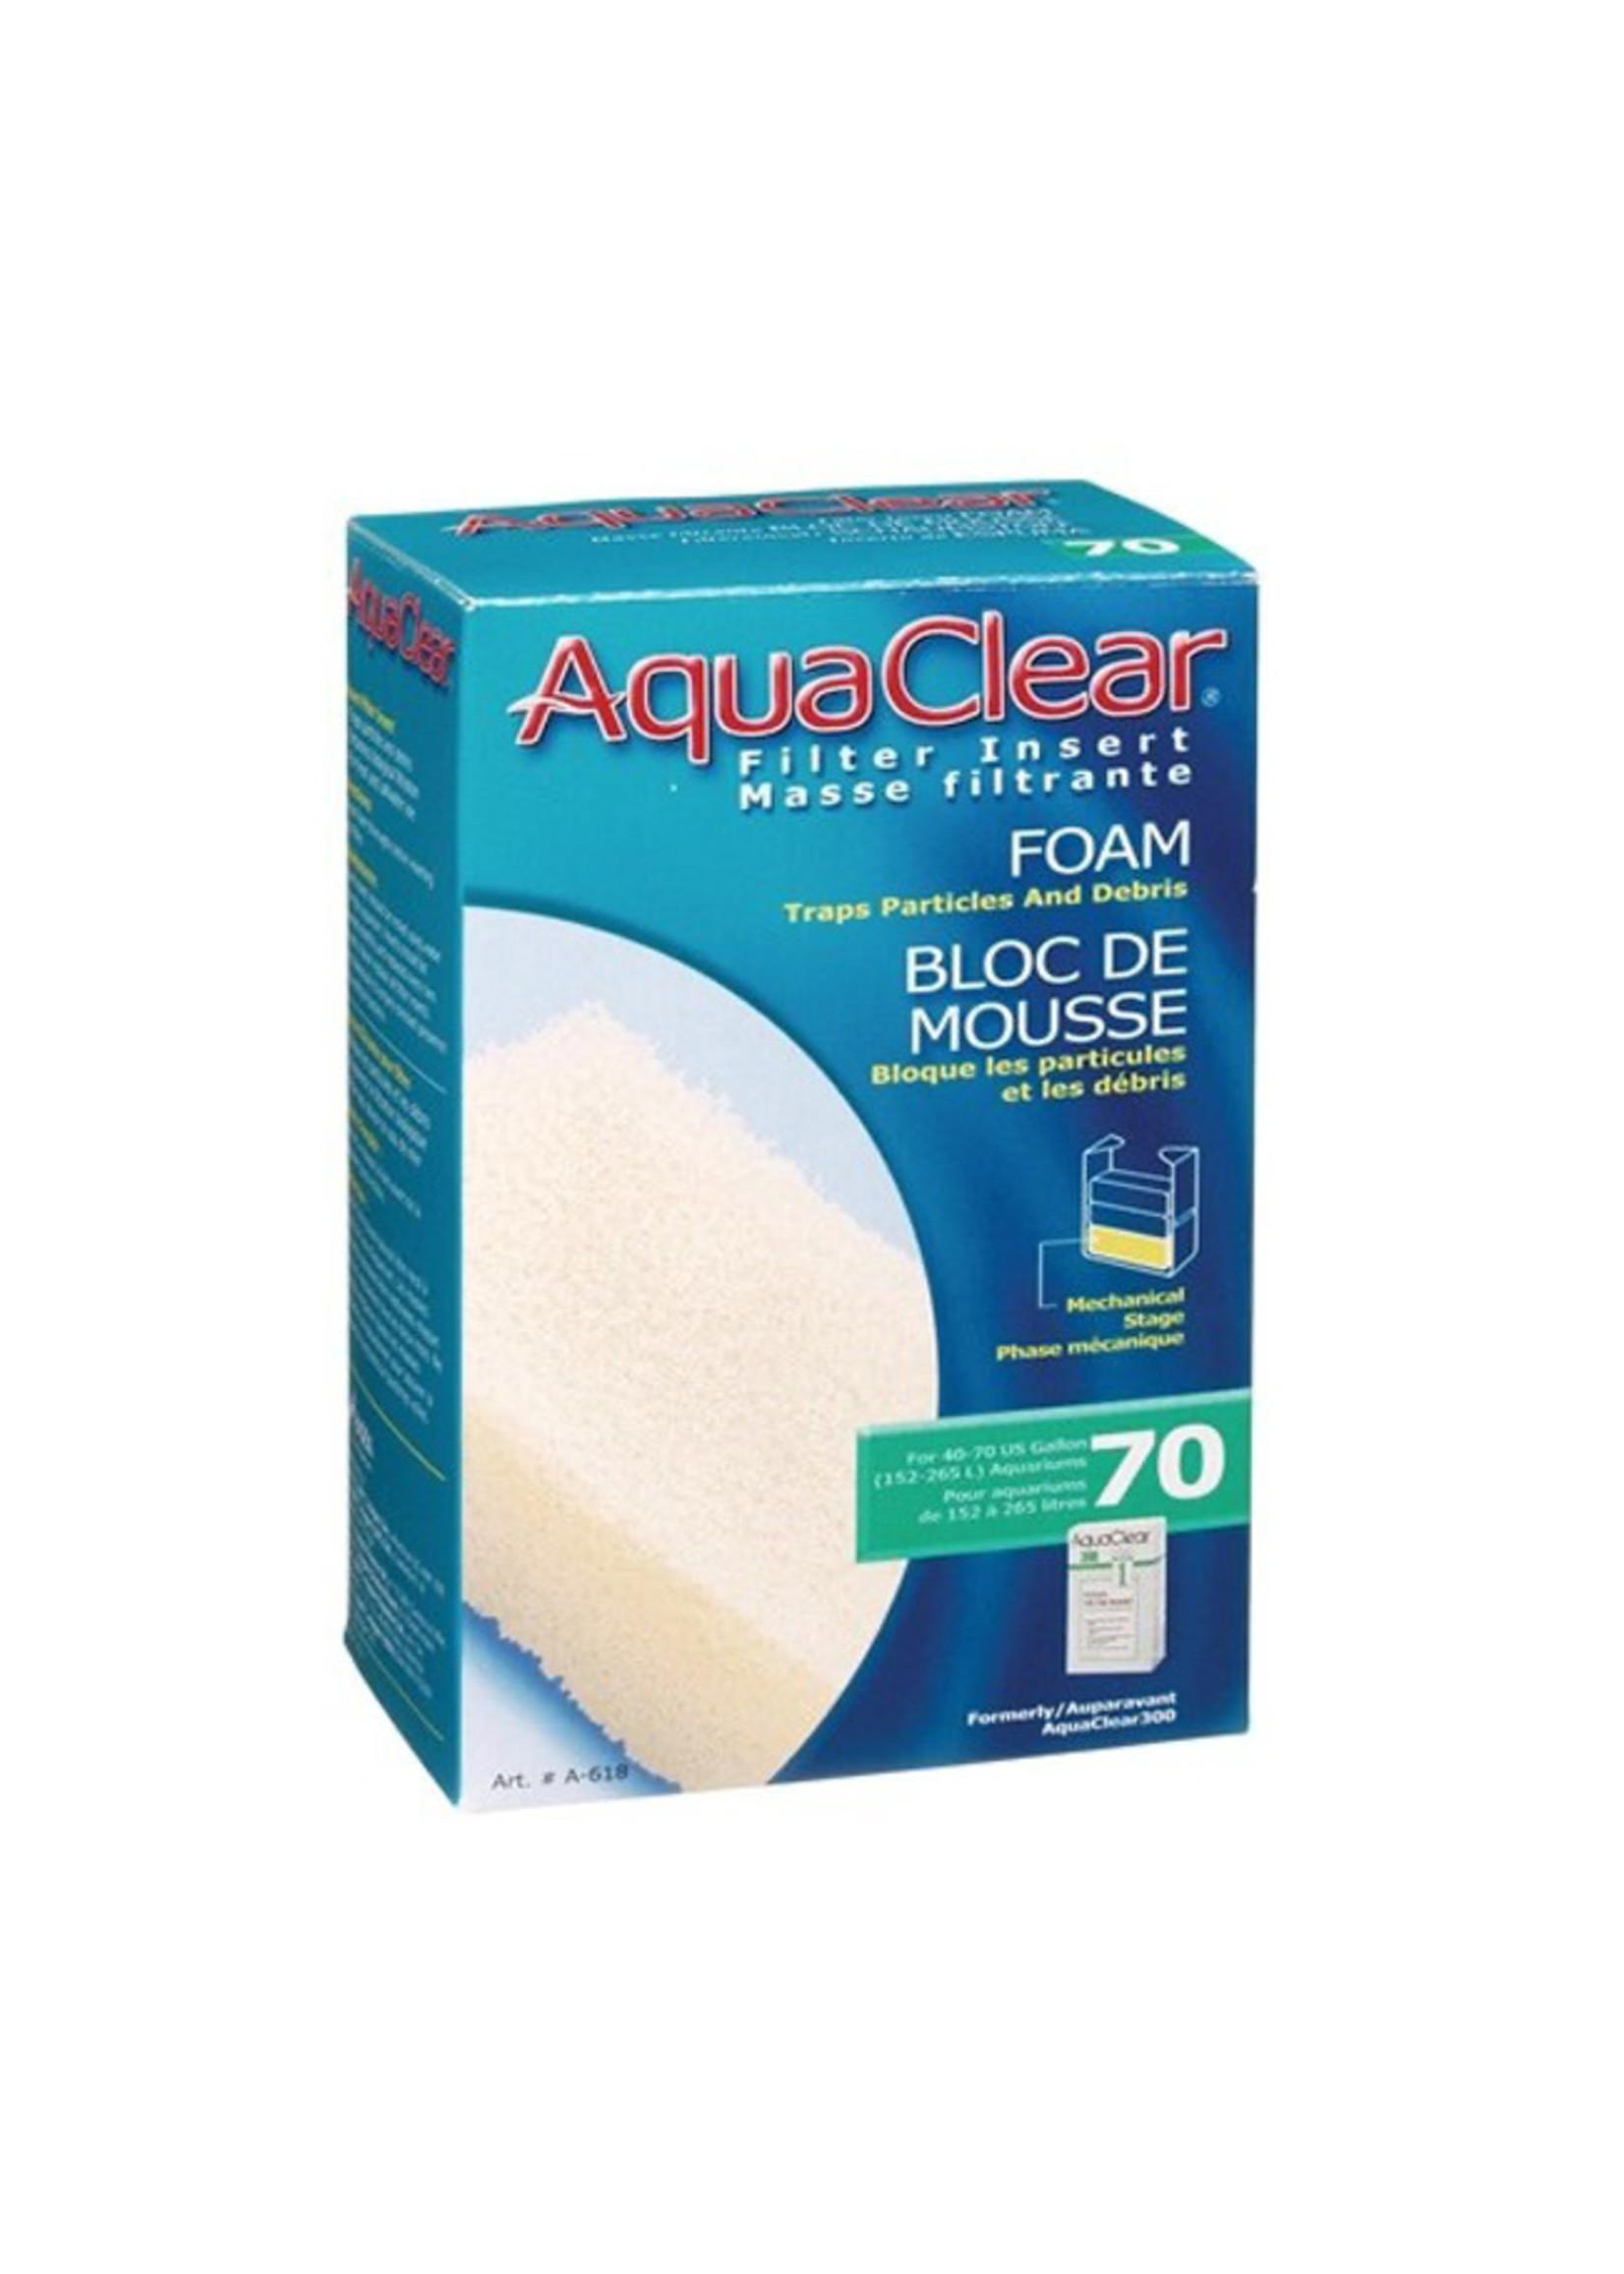 AquaClear AquaClear Filter Insert Foam